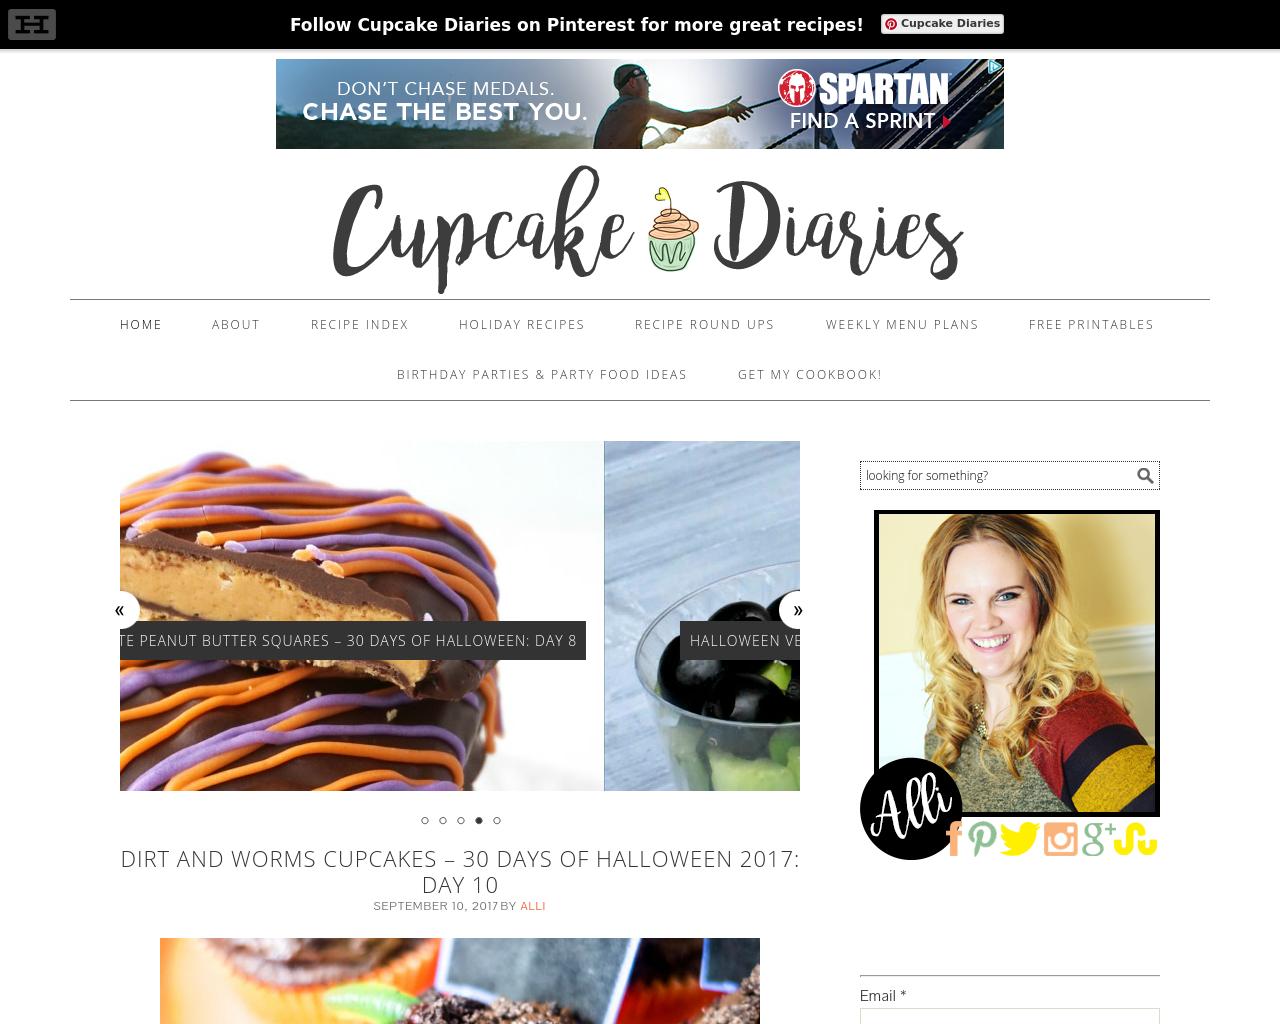 Cupcake-Diaries-Advertising-Reviews-Pricing